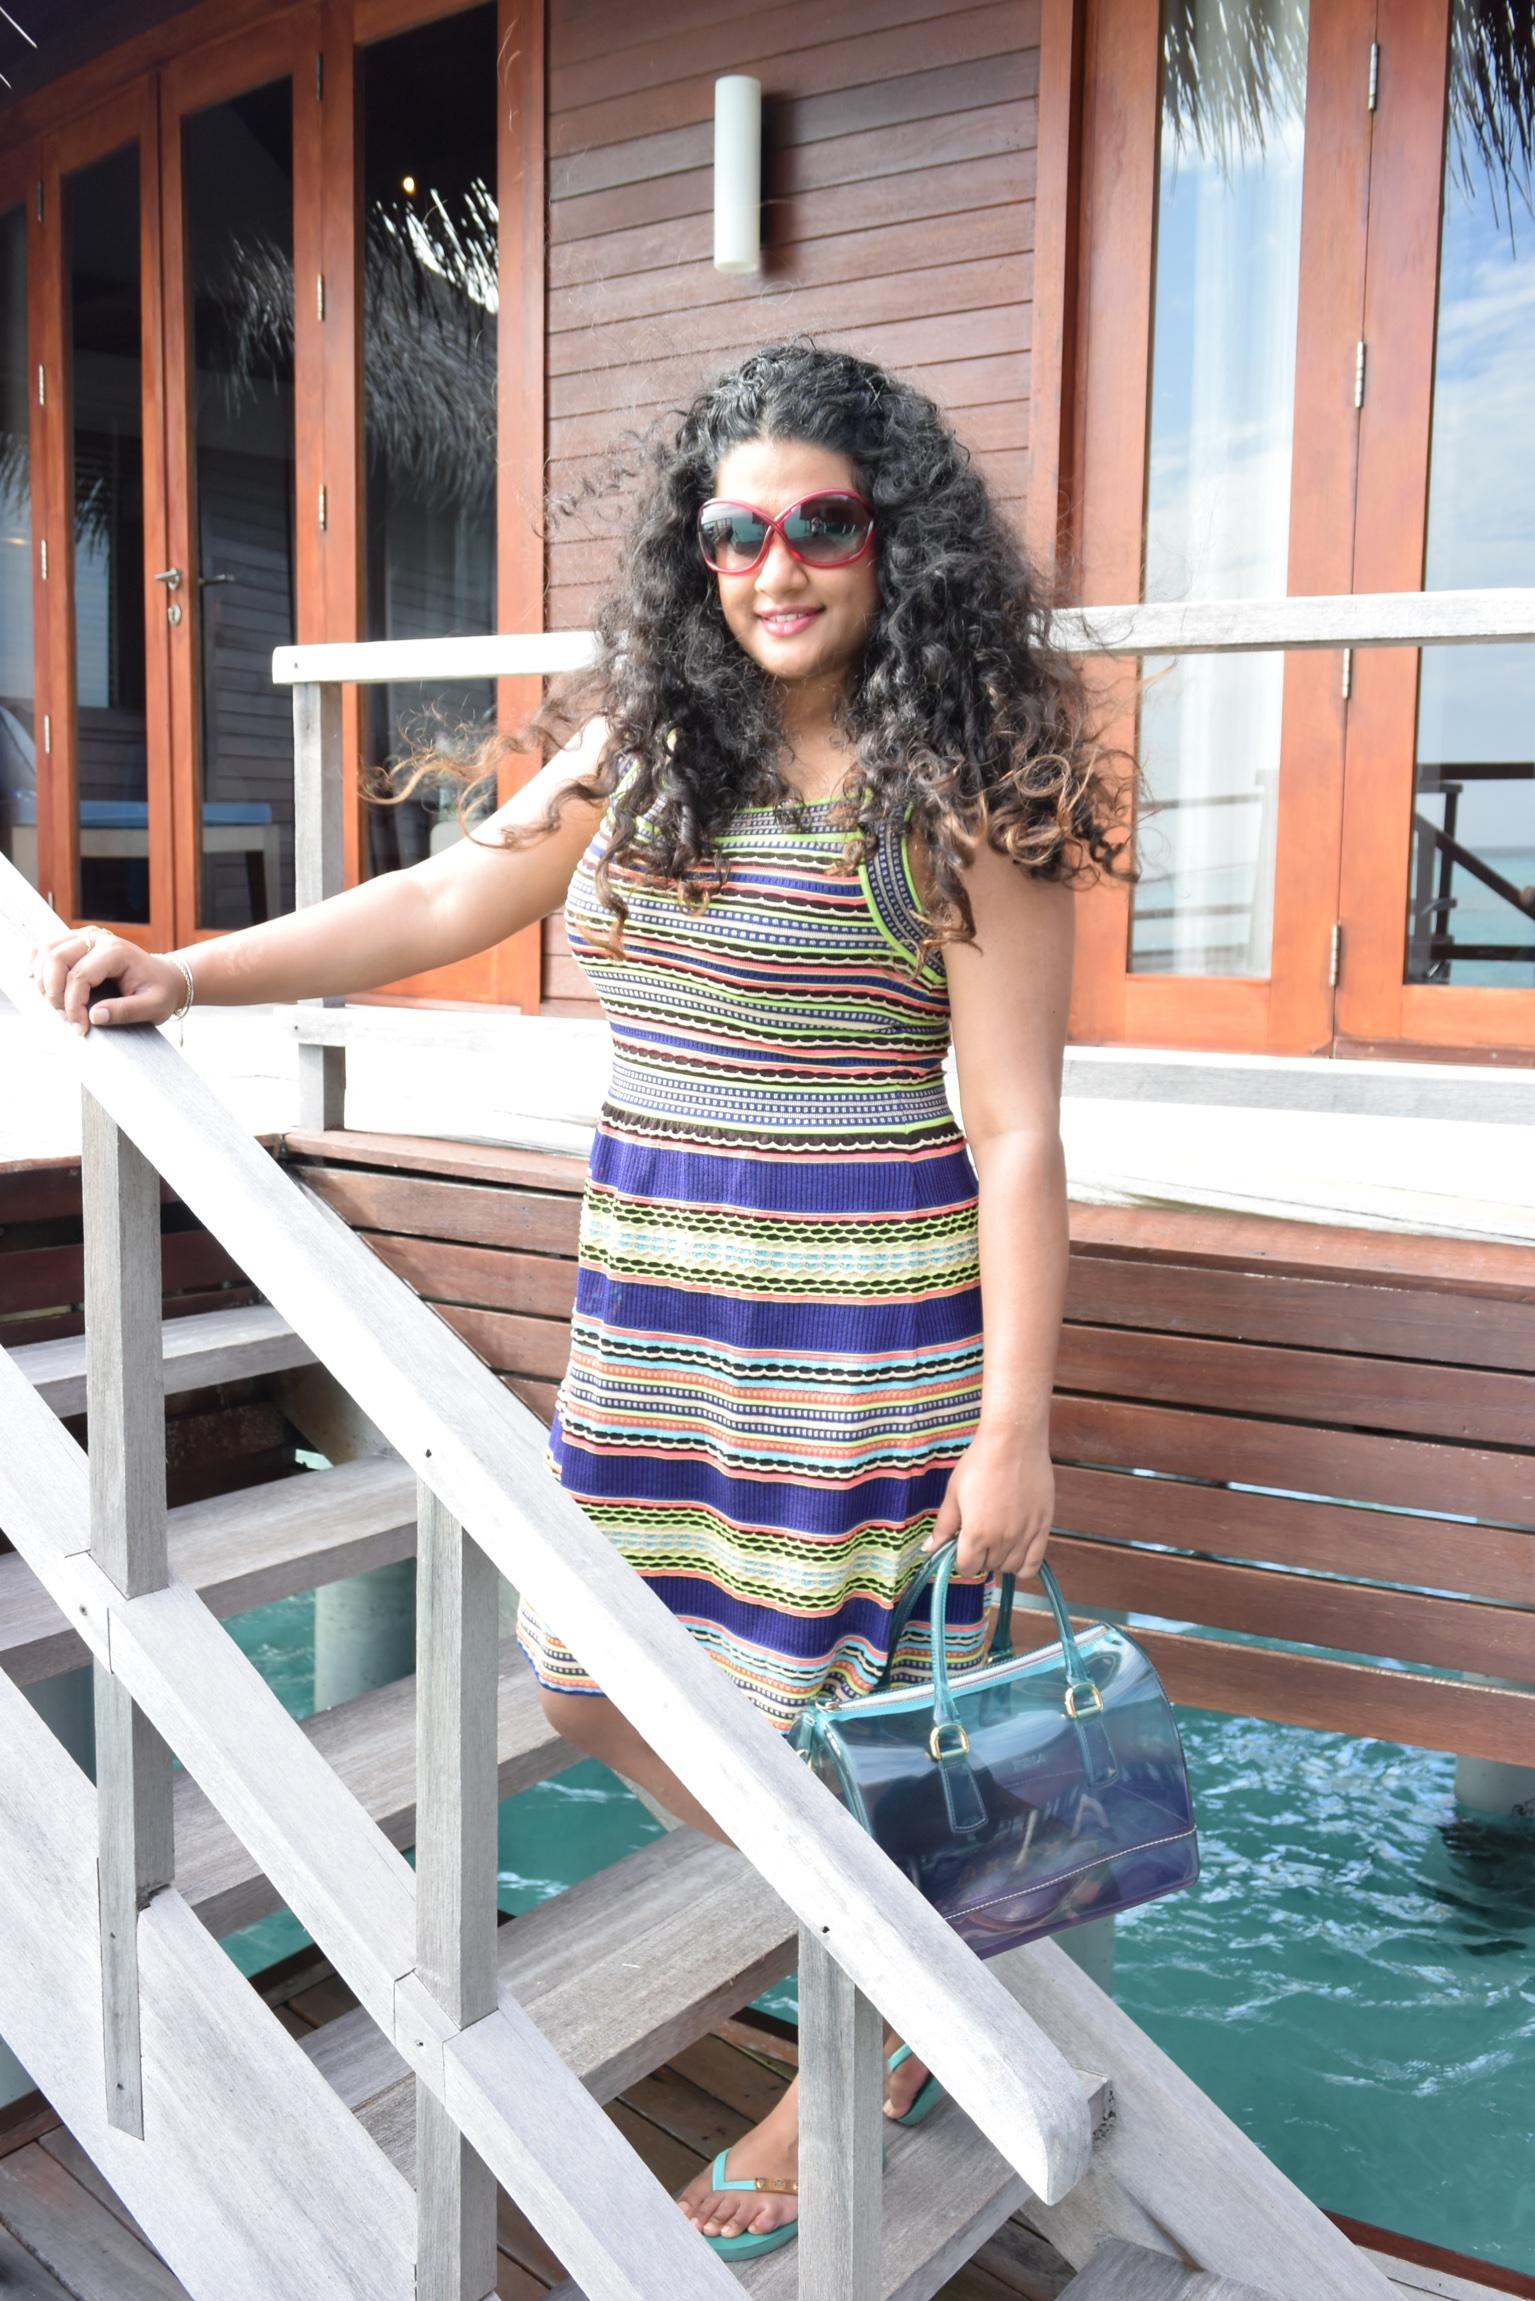 Dress M Missoni, Flip-Flop Tory Burch, Bag Furla, Sunglasses Tom Ford, Hand-harness Isharya